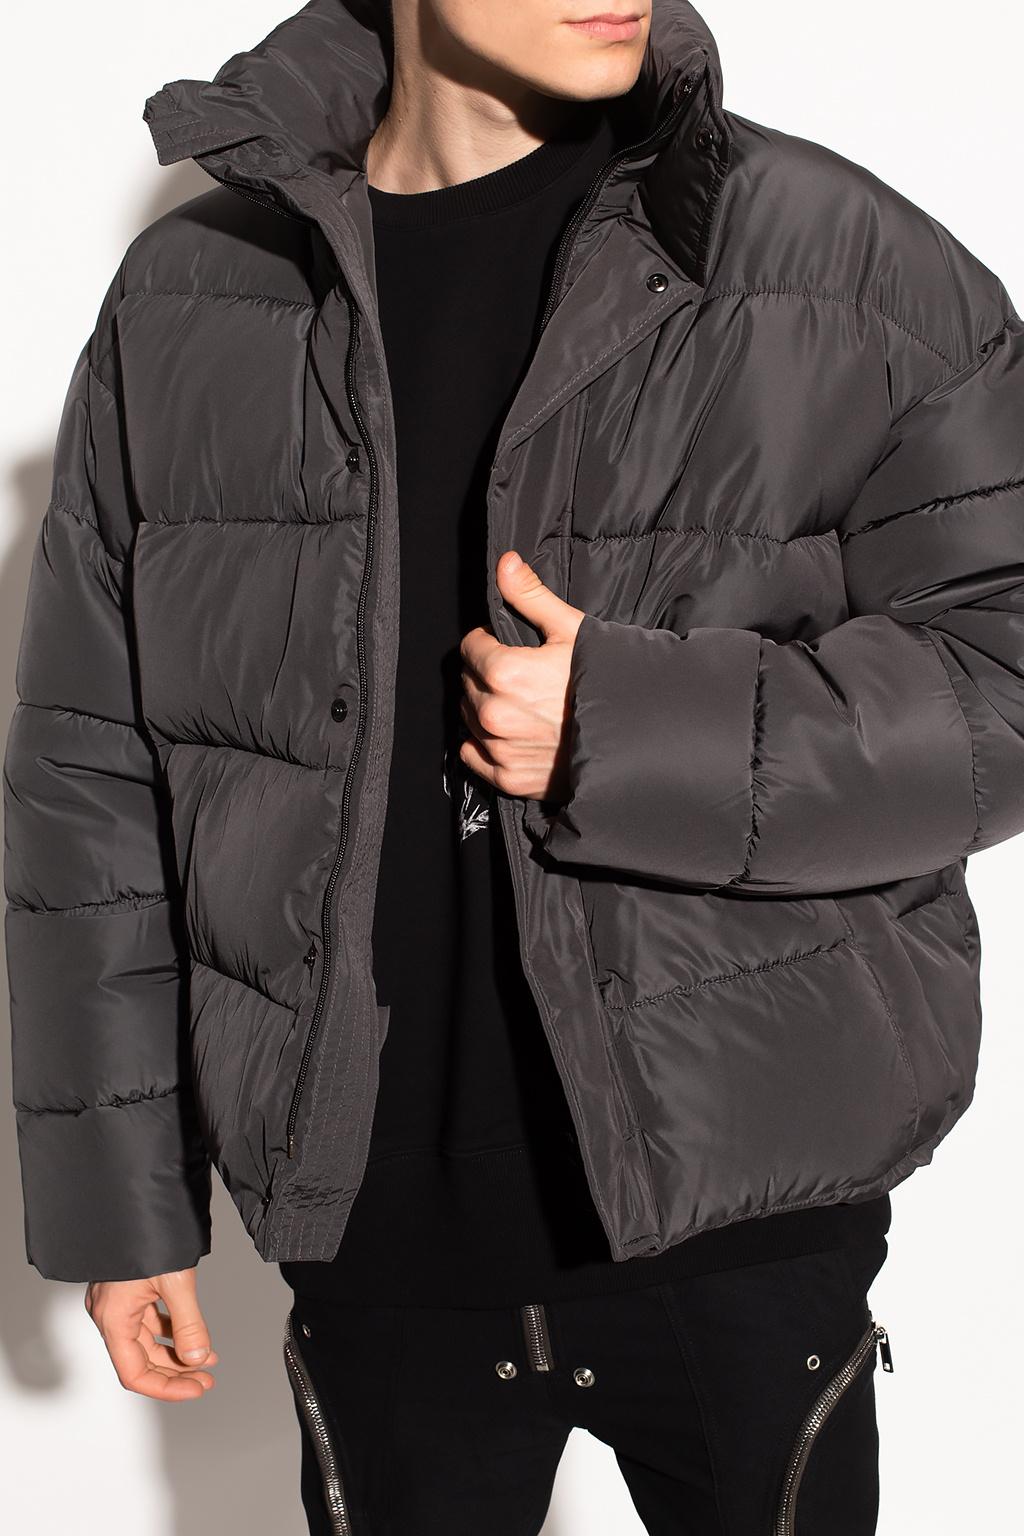 Balenciaga Down jacket